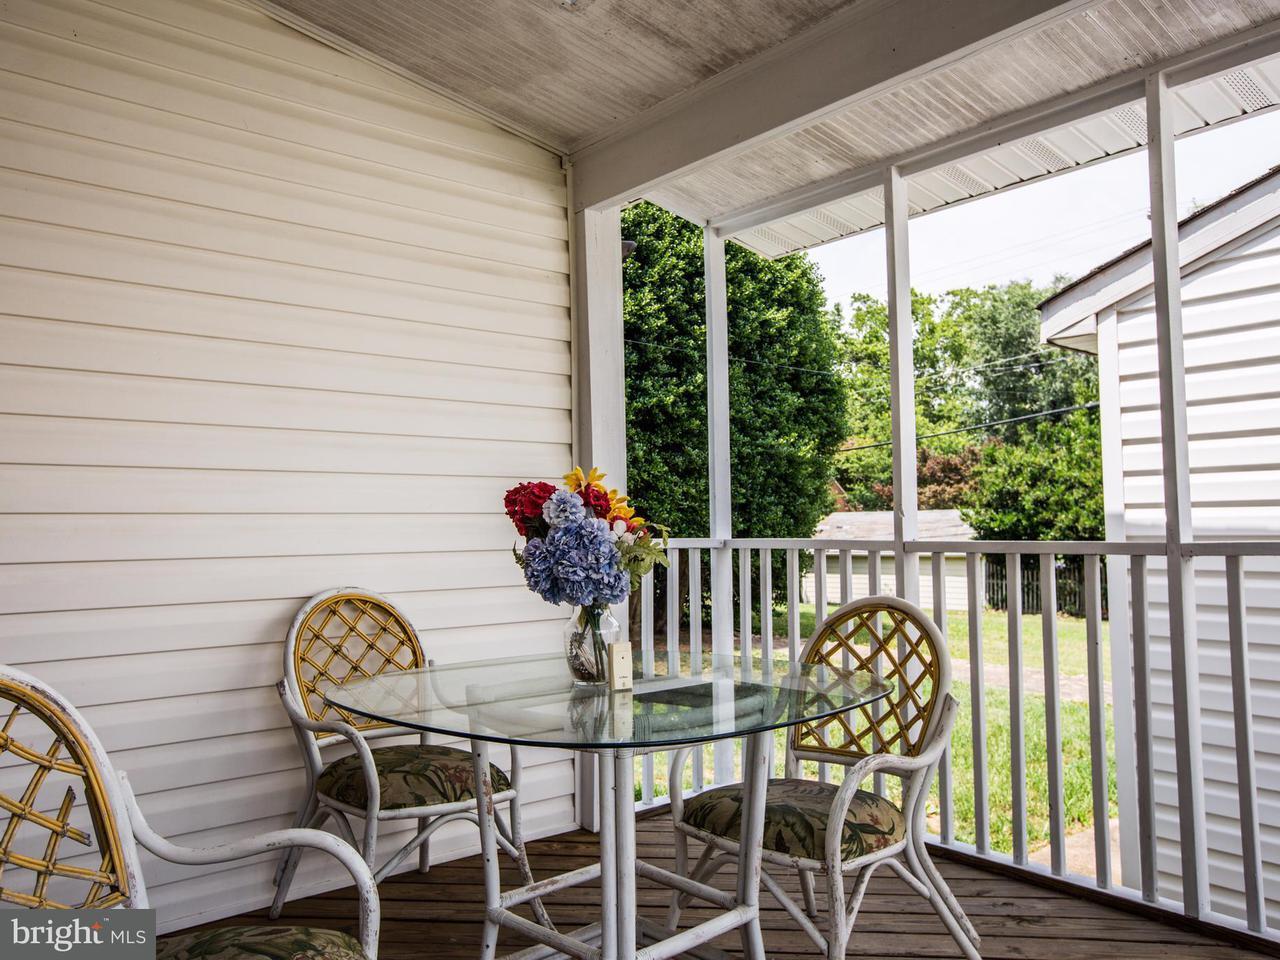 Additional photo for property listing at 1209 Littlepage Street 1209 Littlepage Street Fredericksburg, バージニア 22401 アメリカ合衆国